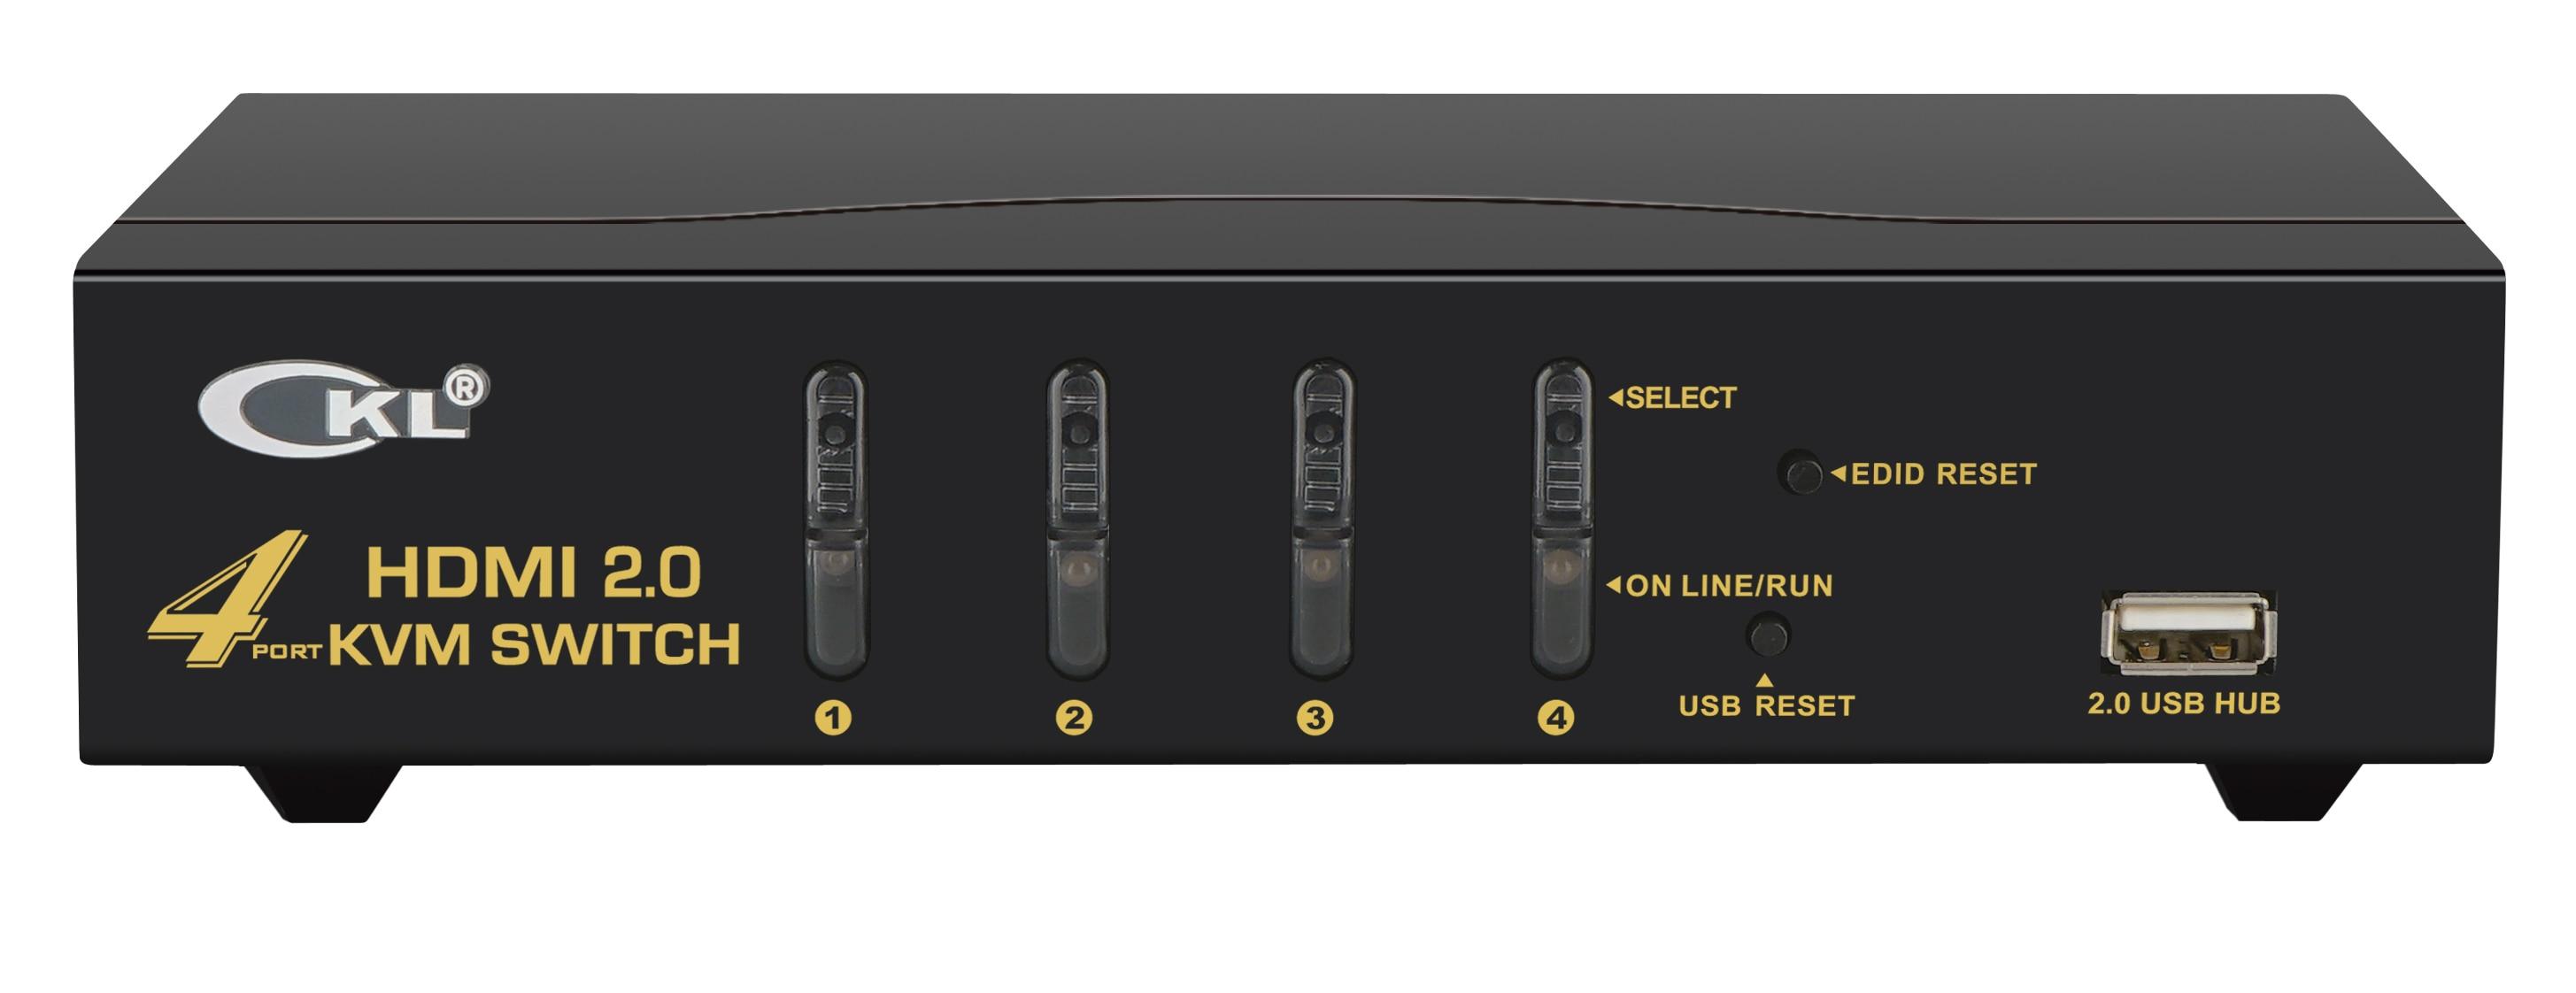 HDMI KVM Switch 4 Port  4Kx2K@60Hz,  3D, YUV 4:4:4  PC Monitor Keyboard Mouse Switcher For Computer Laptop DVR NVR Xbox PS3 PS4